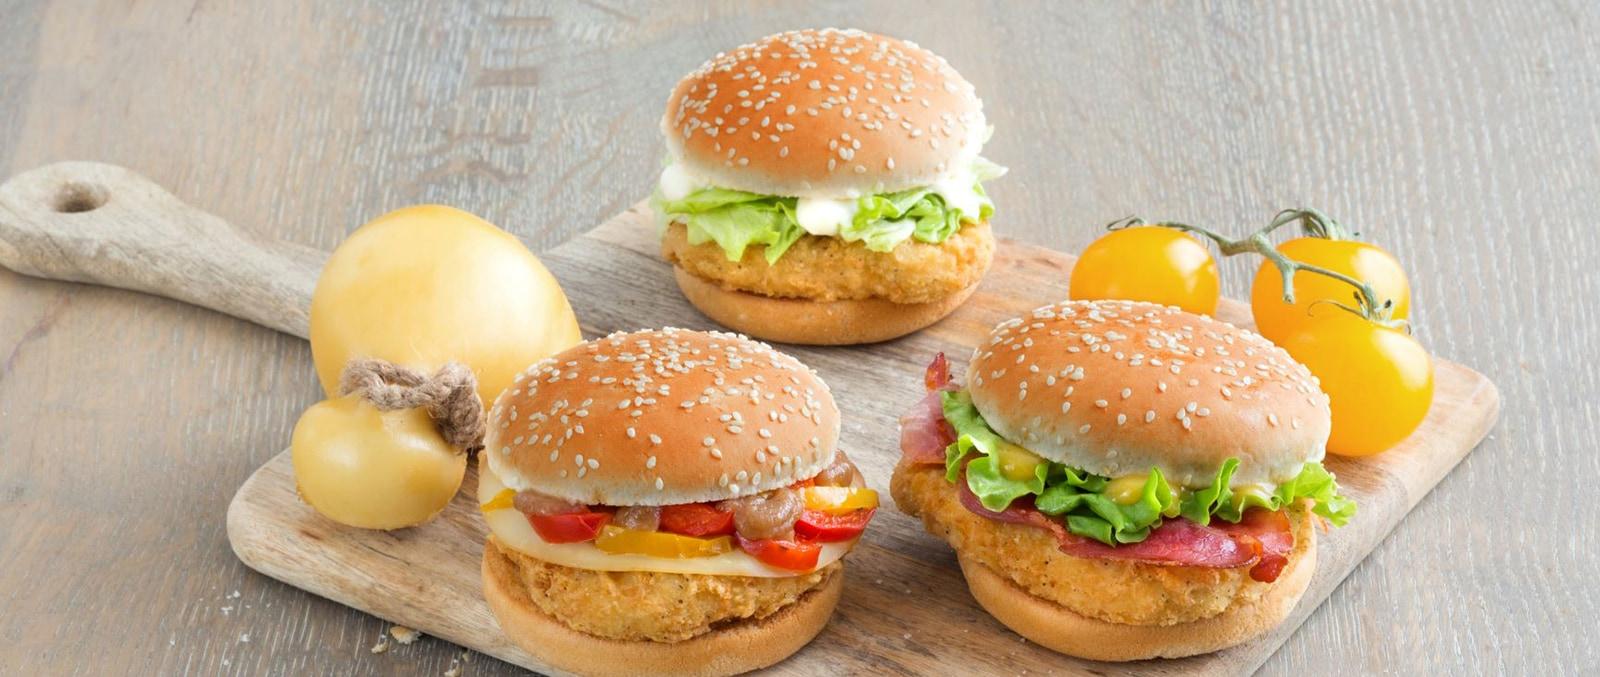 Panino-McDonalds-Audace